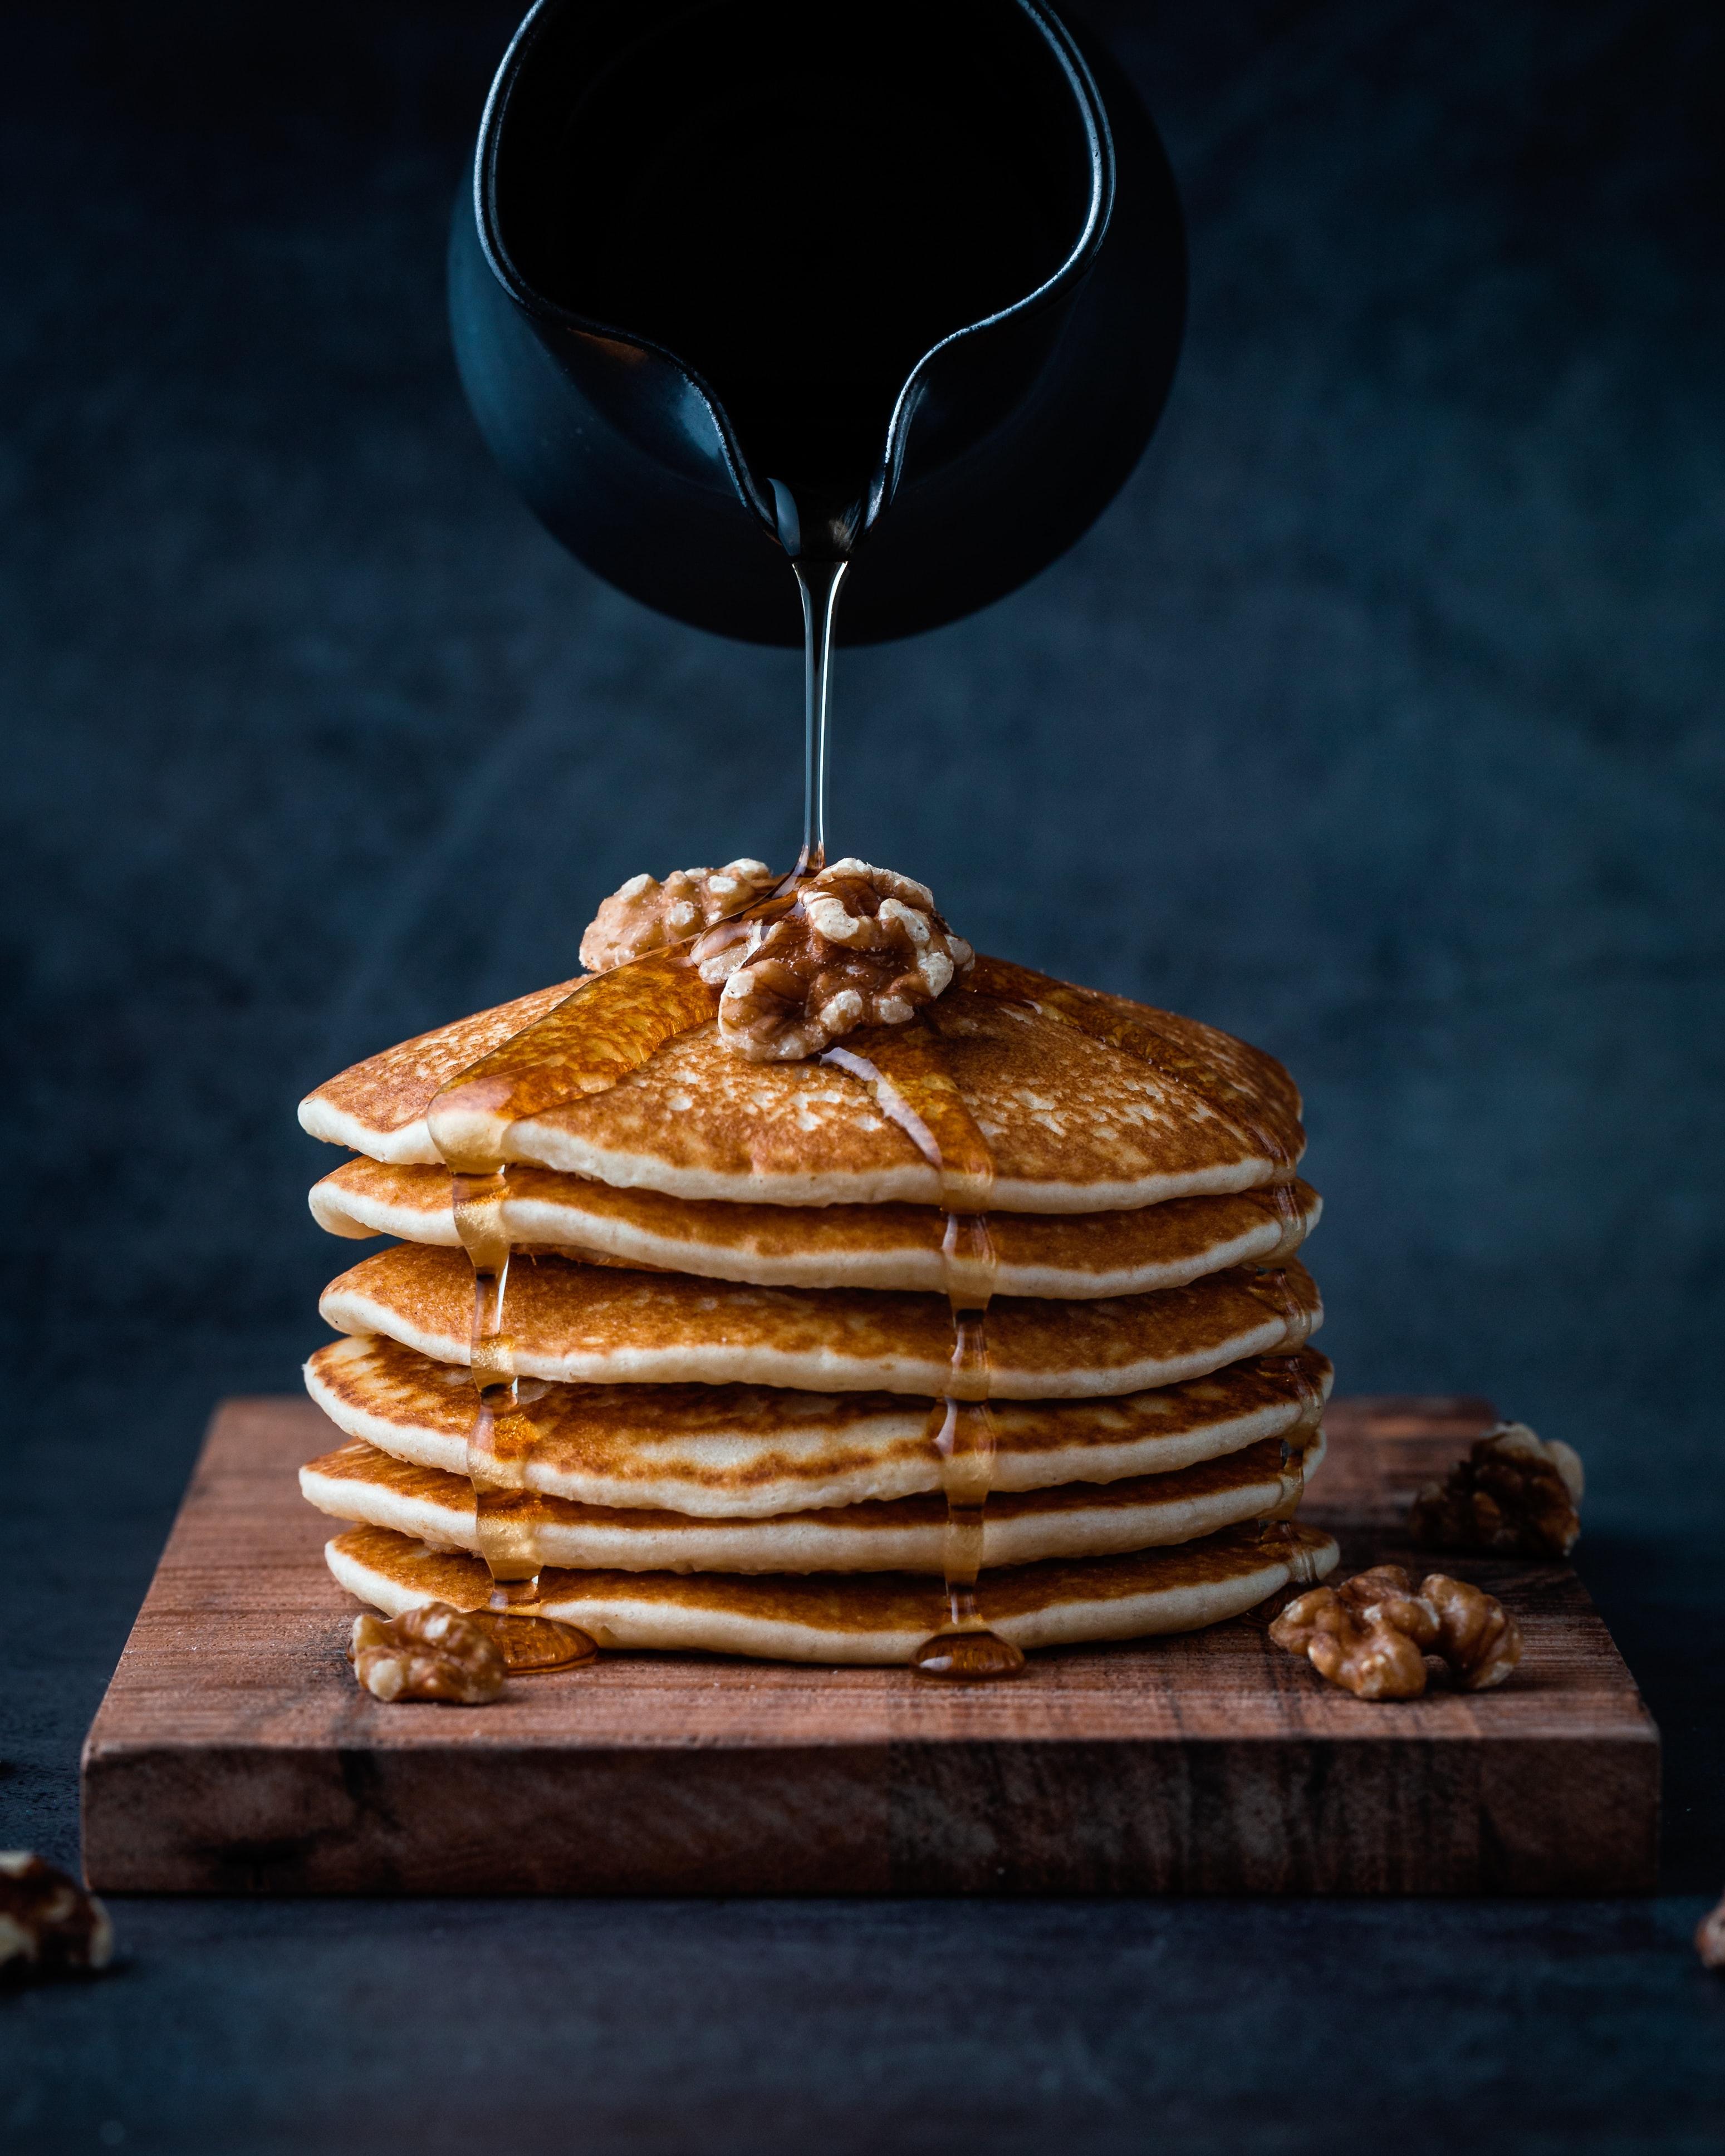 Drizzling Manuka Honey over layered Pancakes